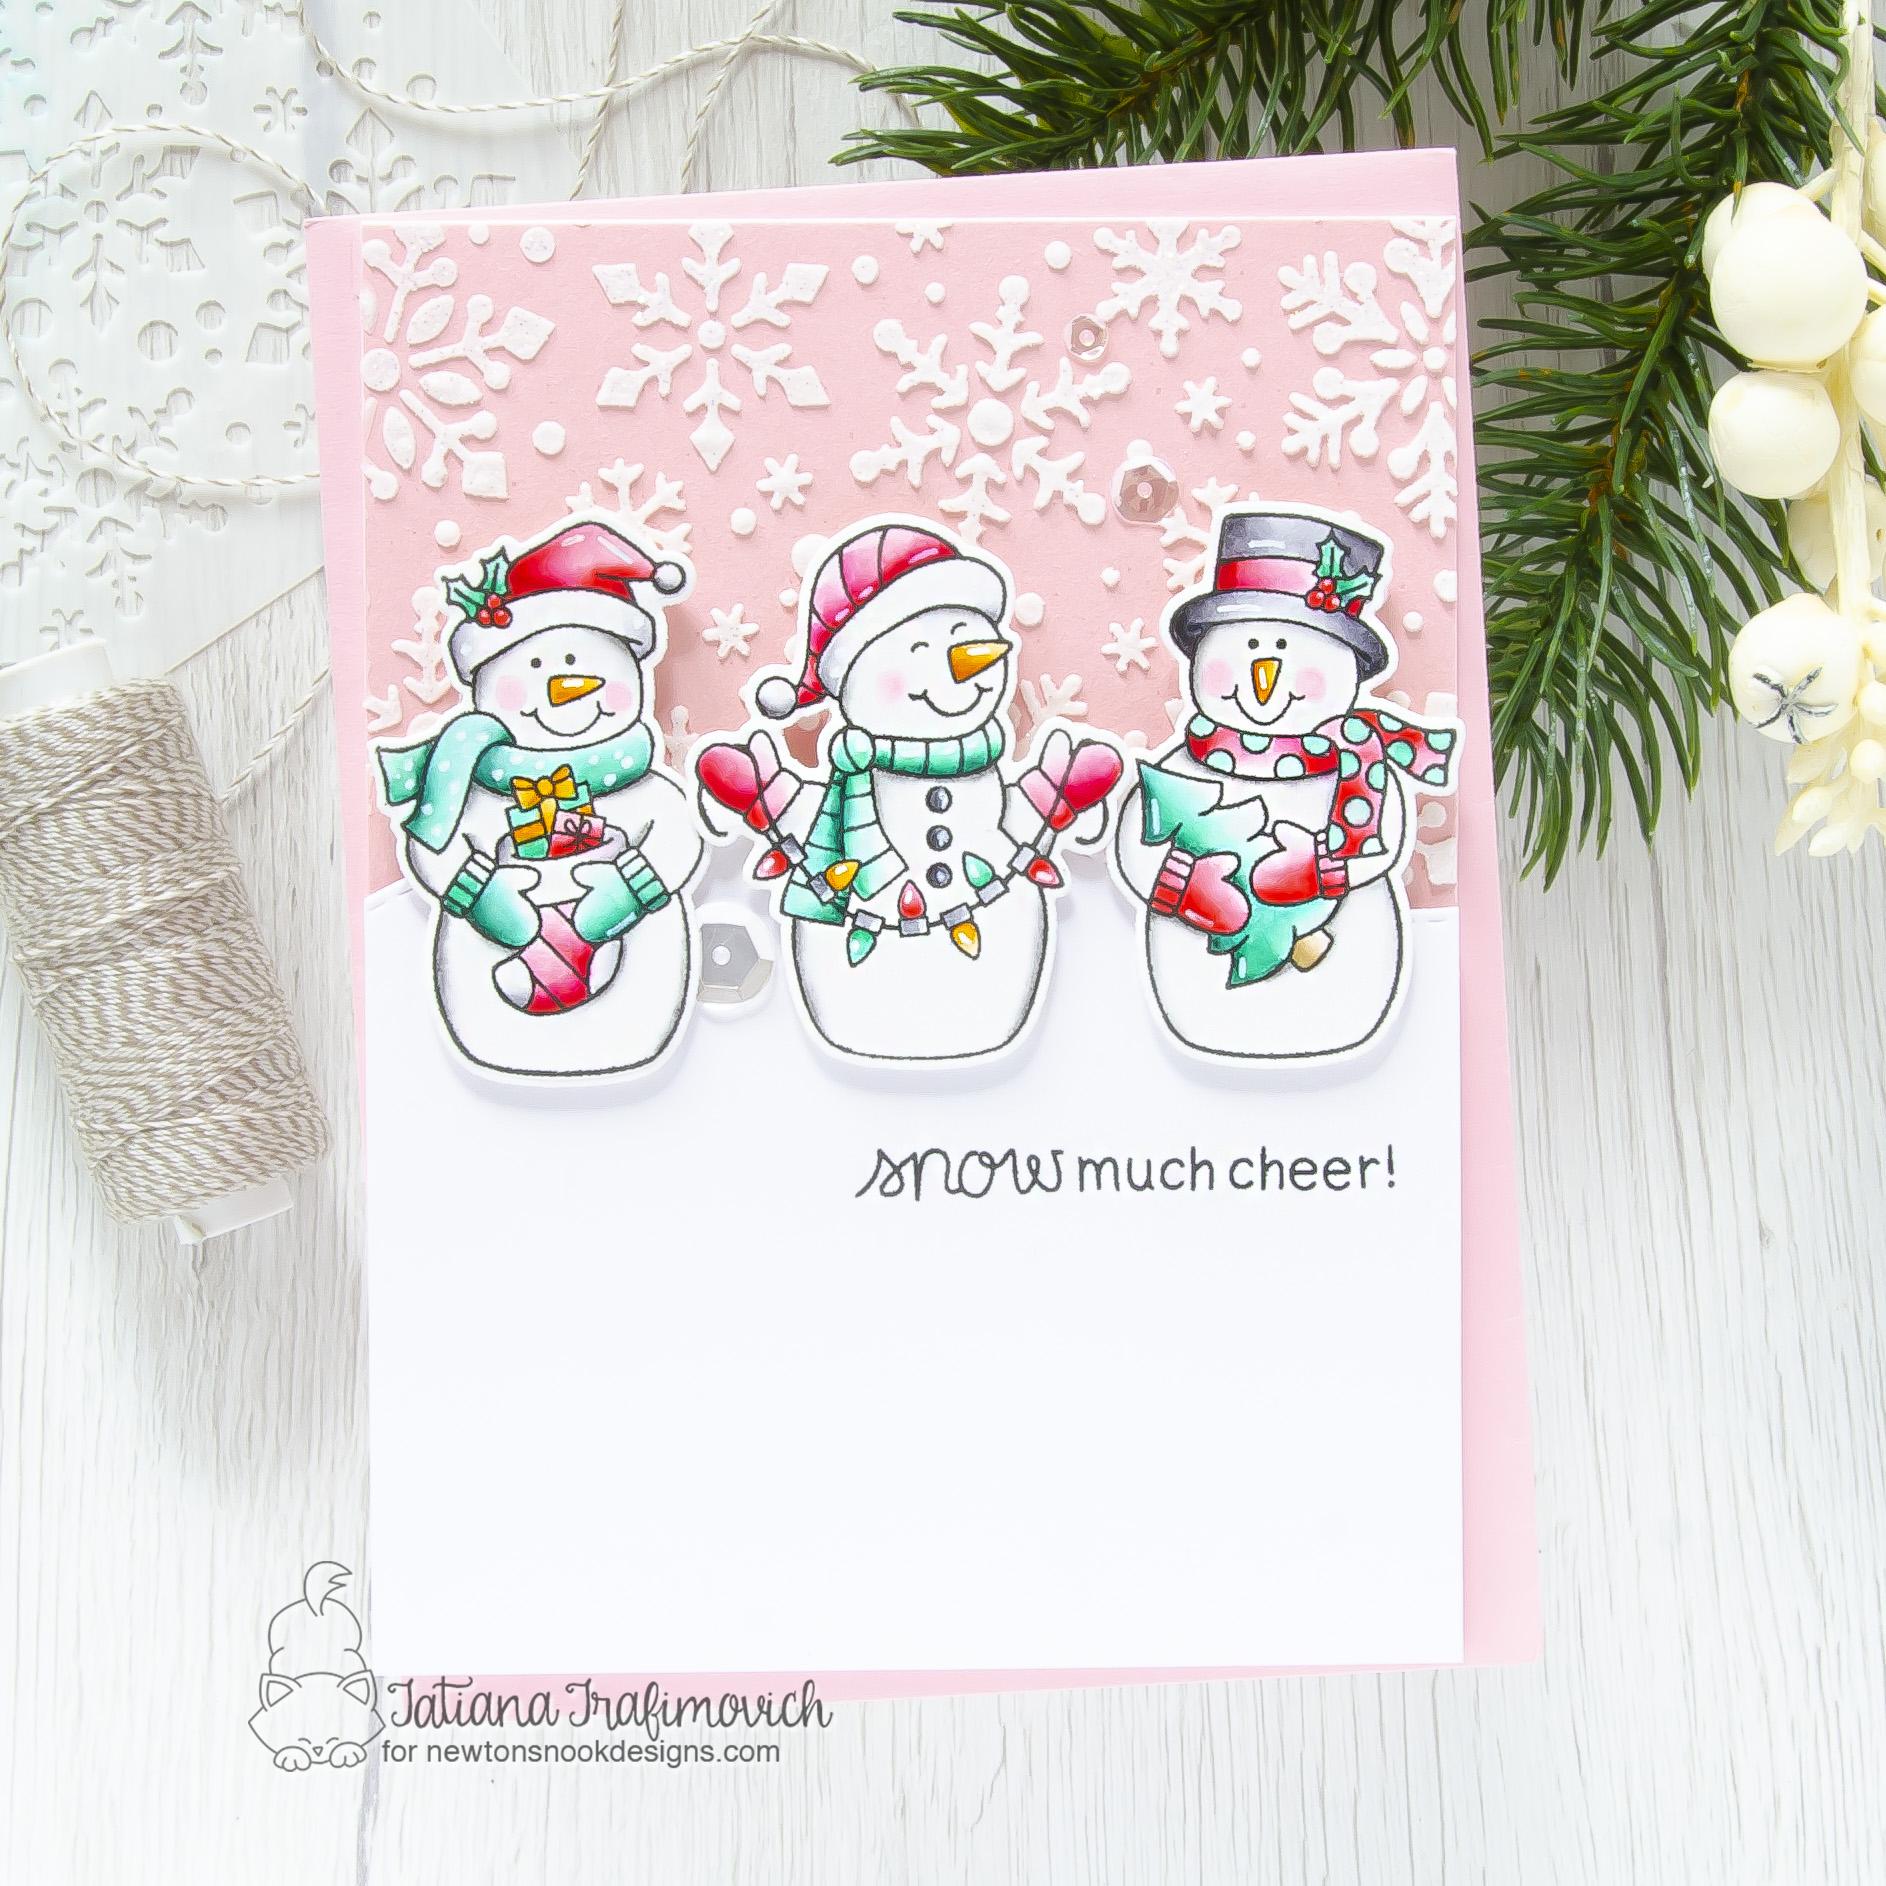 Snow Much Cheer #handmade card by Tatiana Trafimovich #tatianacraftandart - Snow Much Cheer stamp set by Newton's Nook Designs #newtonsnook